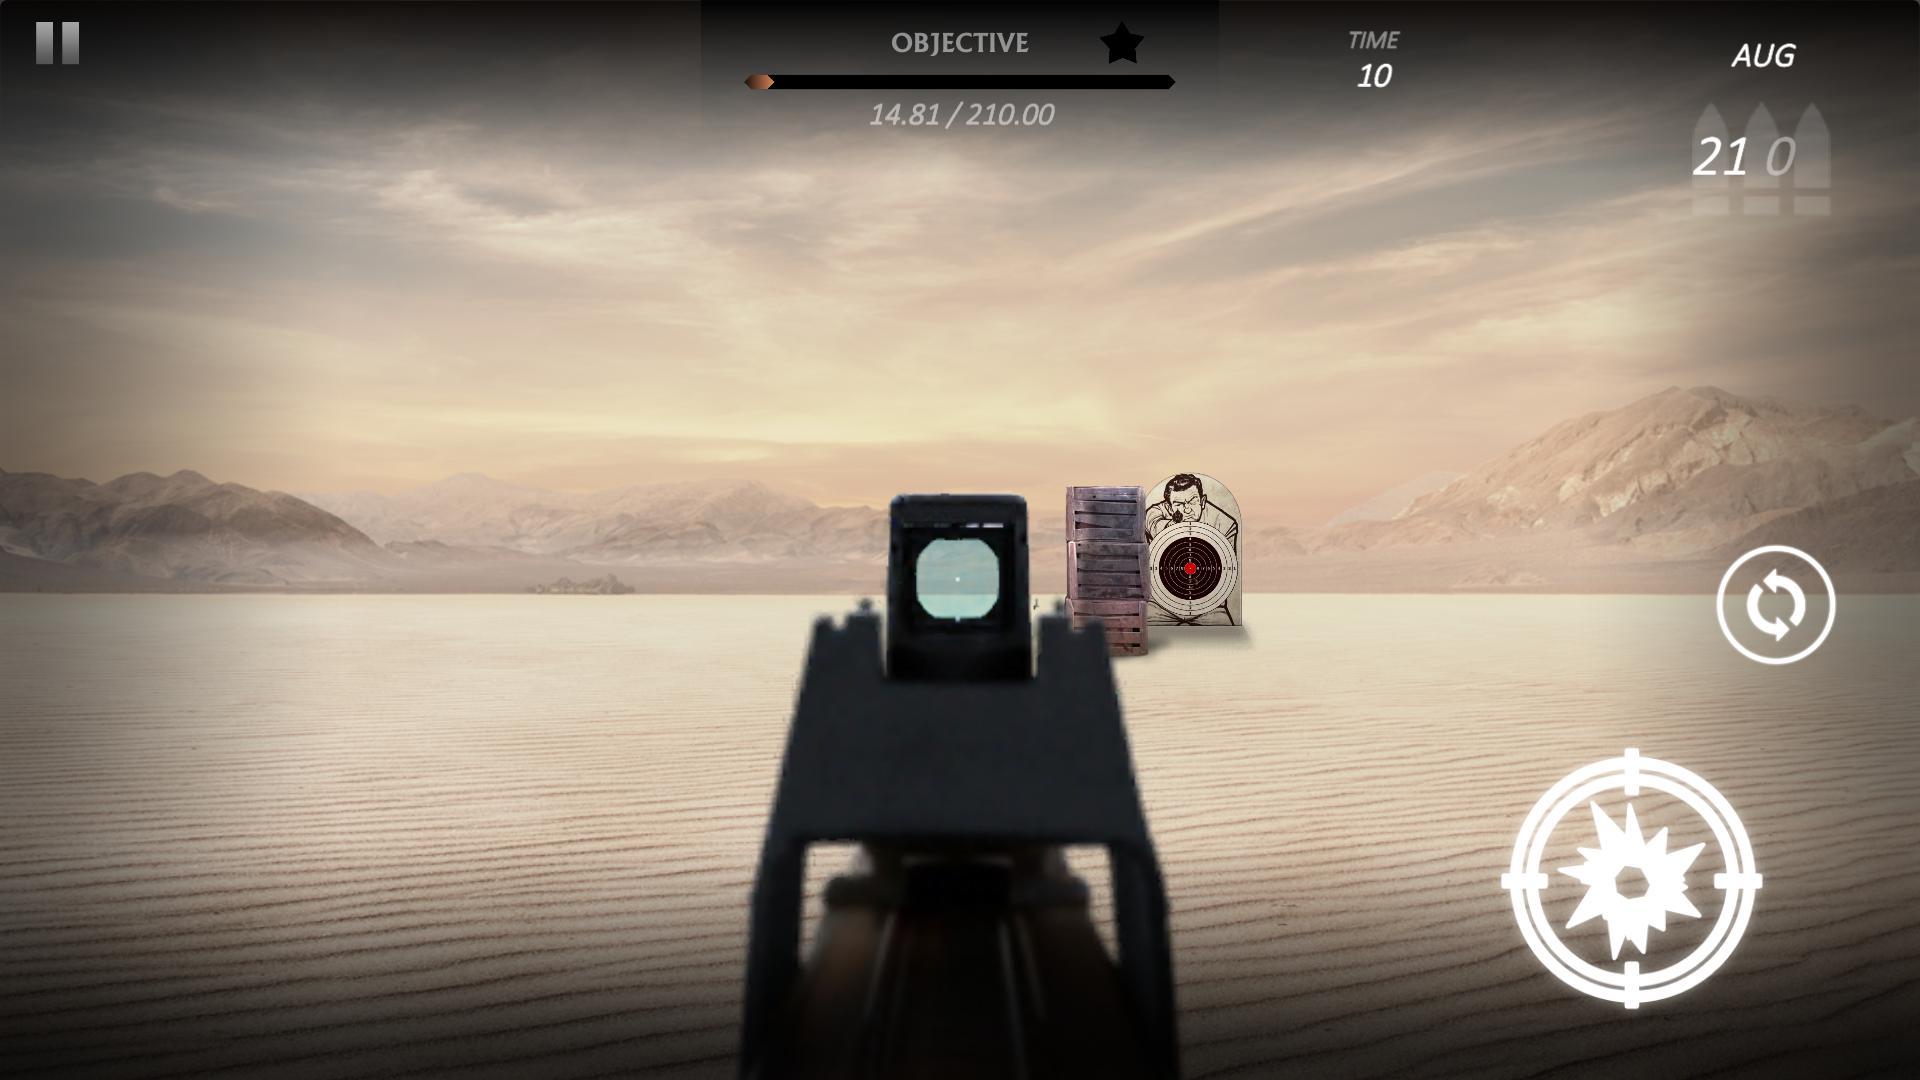 Canyon Shooting 2 - Free Shooting Range 3.0.6 Screenshot 3